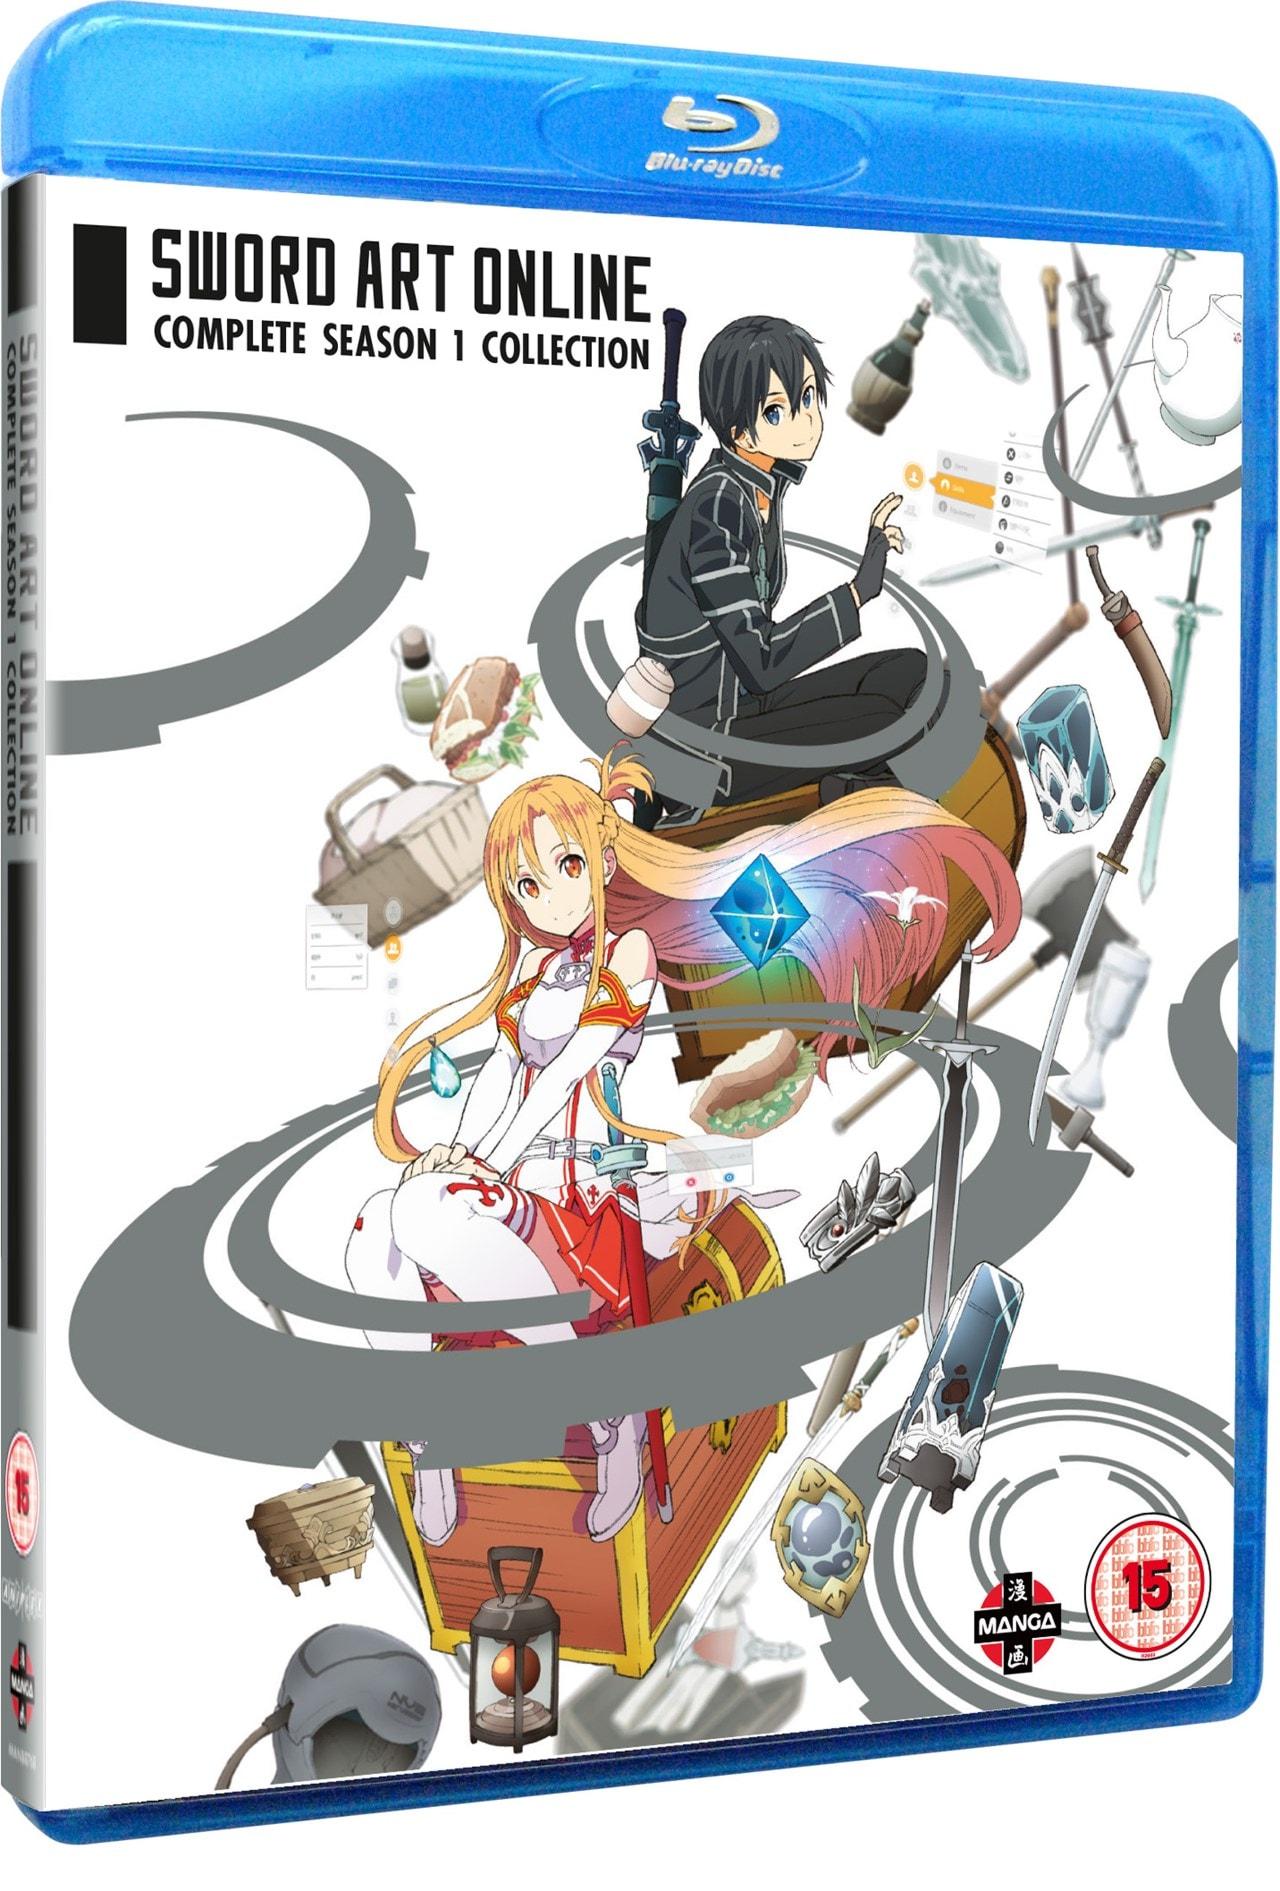 Sword Art Online: Complete Season 1 Collection - 2